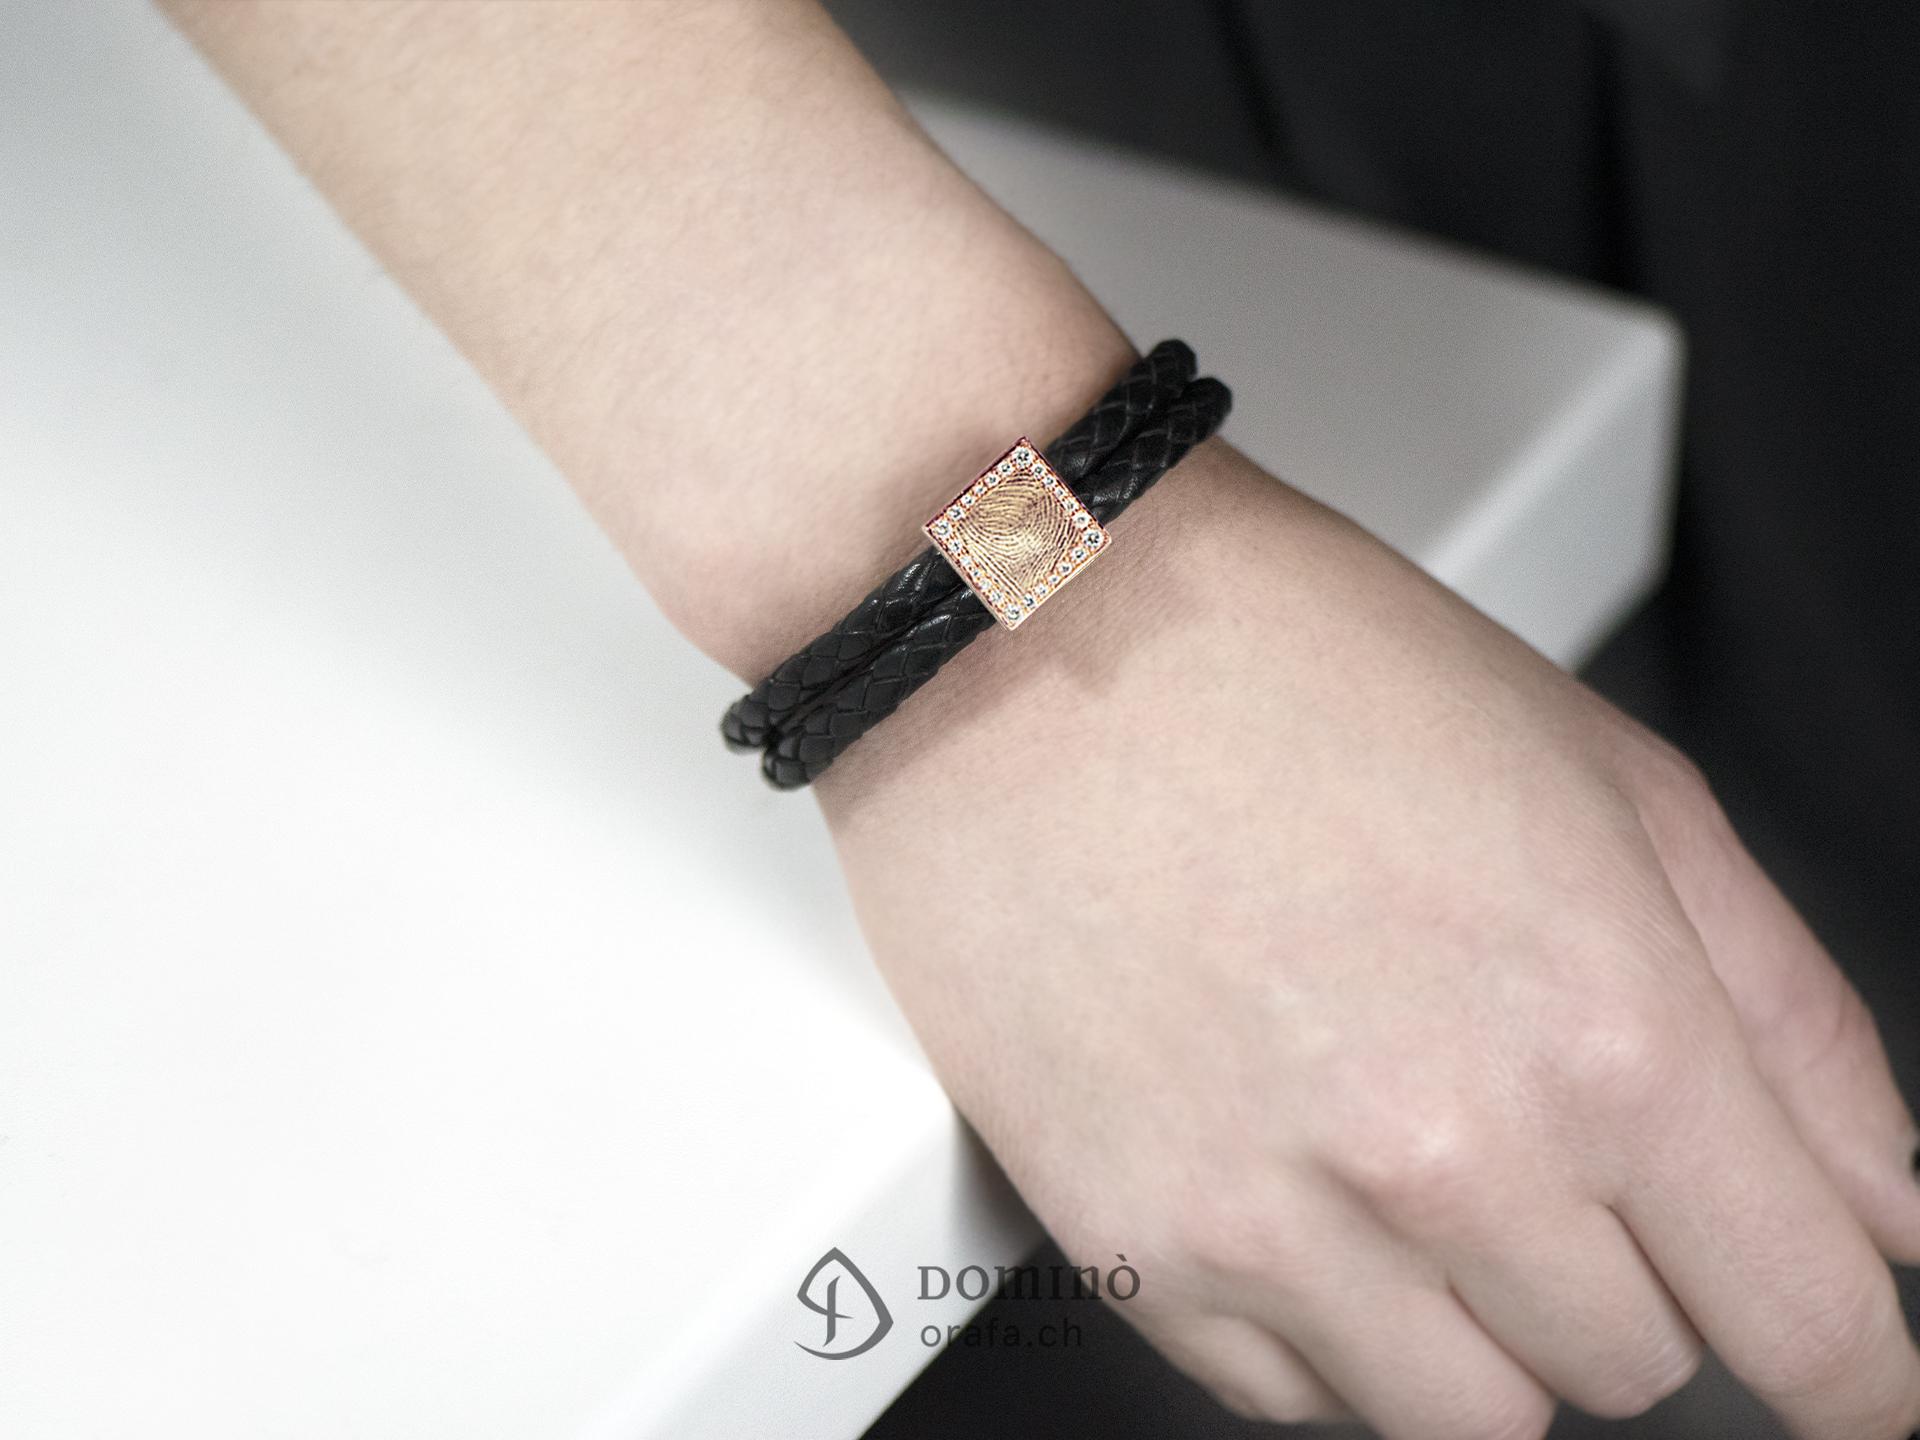 braccialetto-cuoio-impronta-digitale-quadrata-contorno-diamanti-3